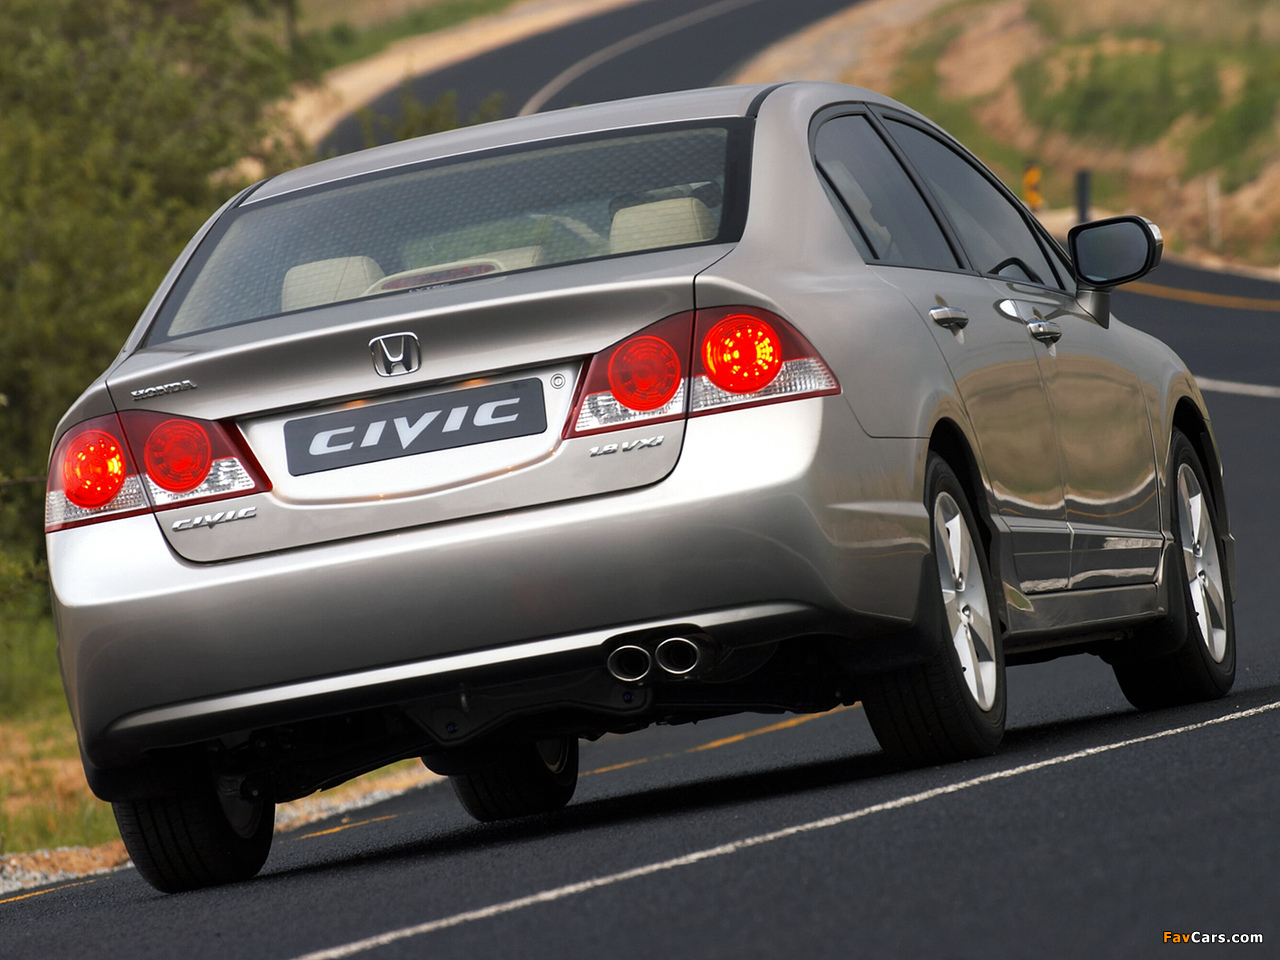 Images of Honda Civic Sedan ZA-spec (FD) 2006–08 (1280x960)